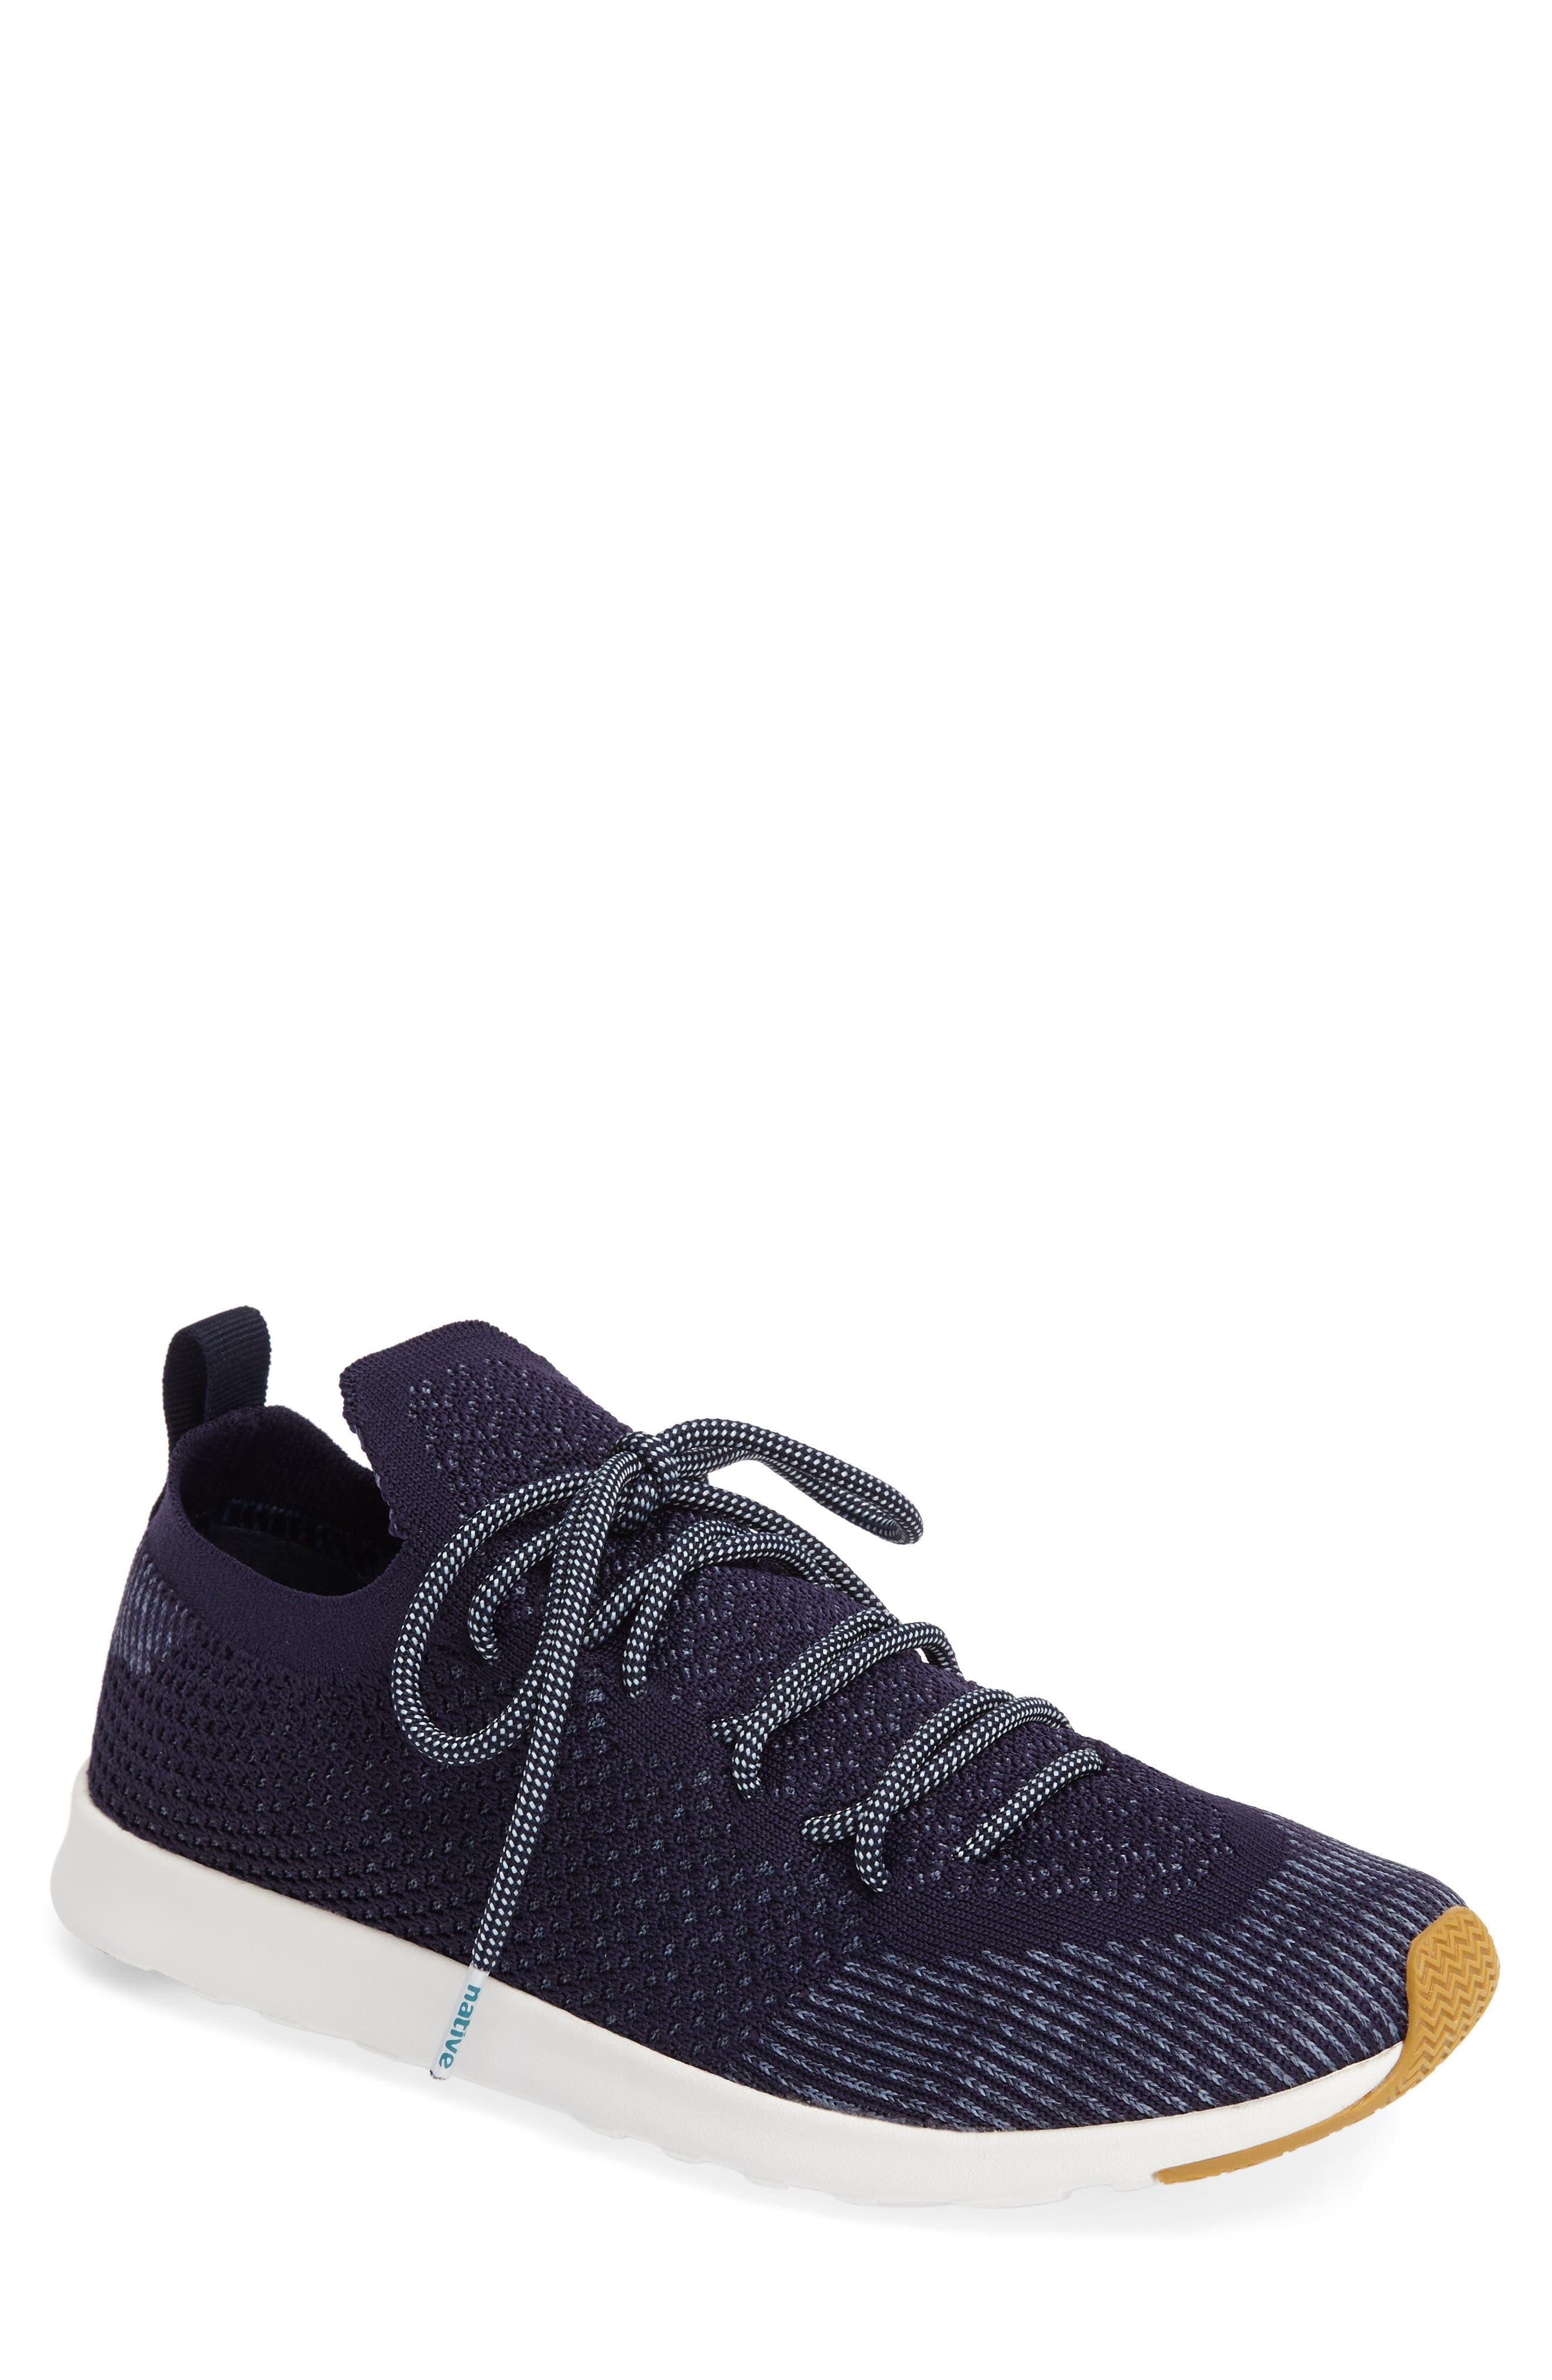 Main Image - Native Shoes AP Mercury Liteknit™ Sneaker